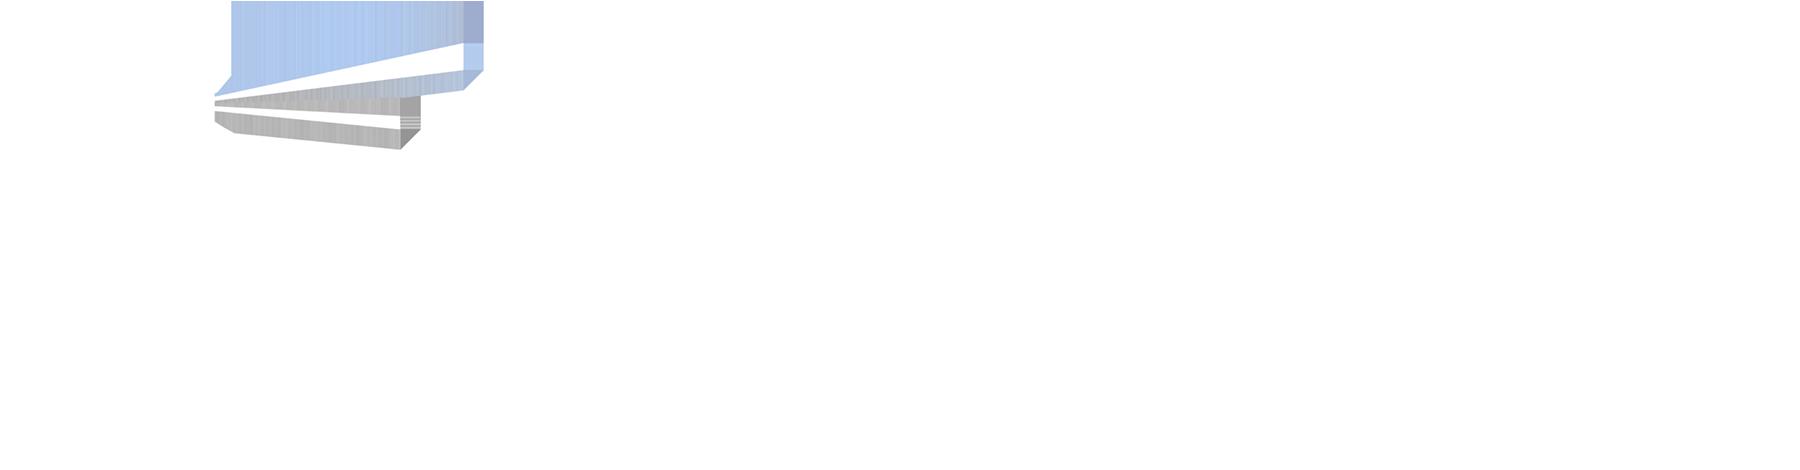 Fotokurs Unternehmen